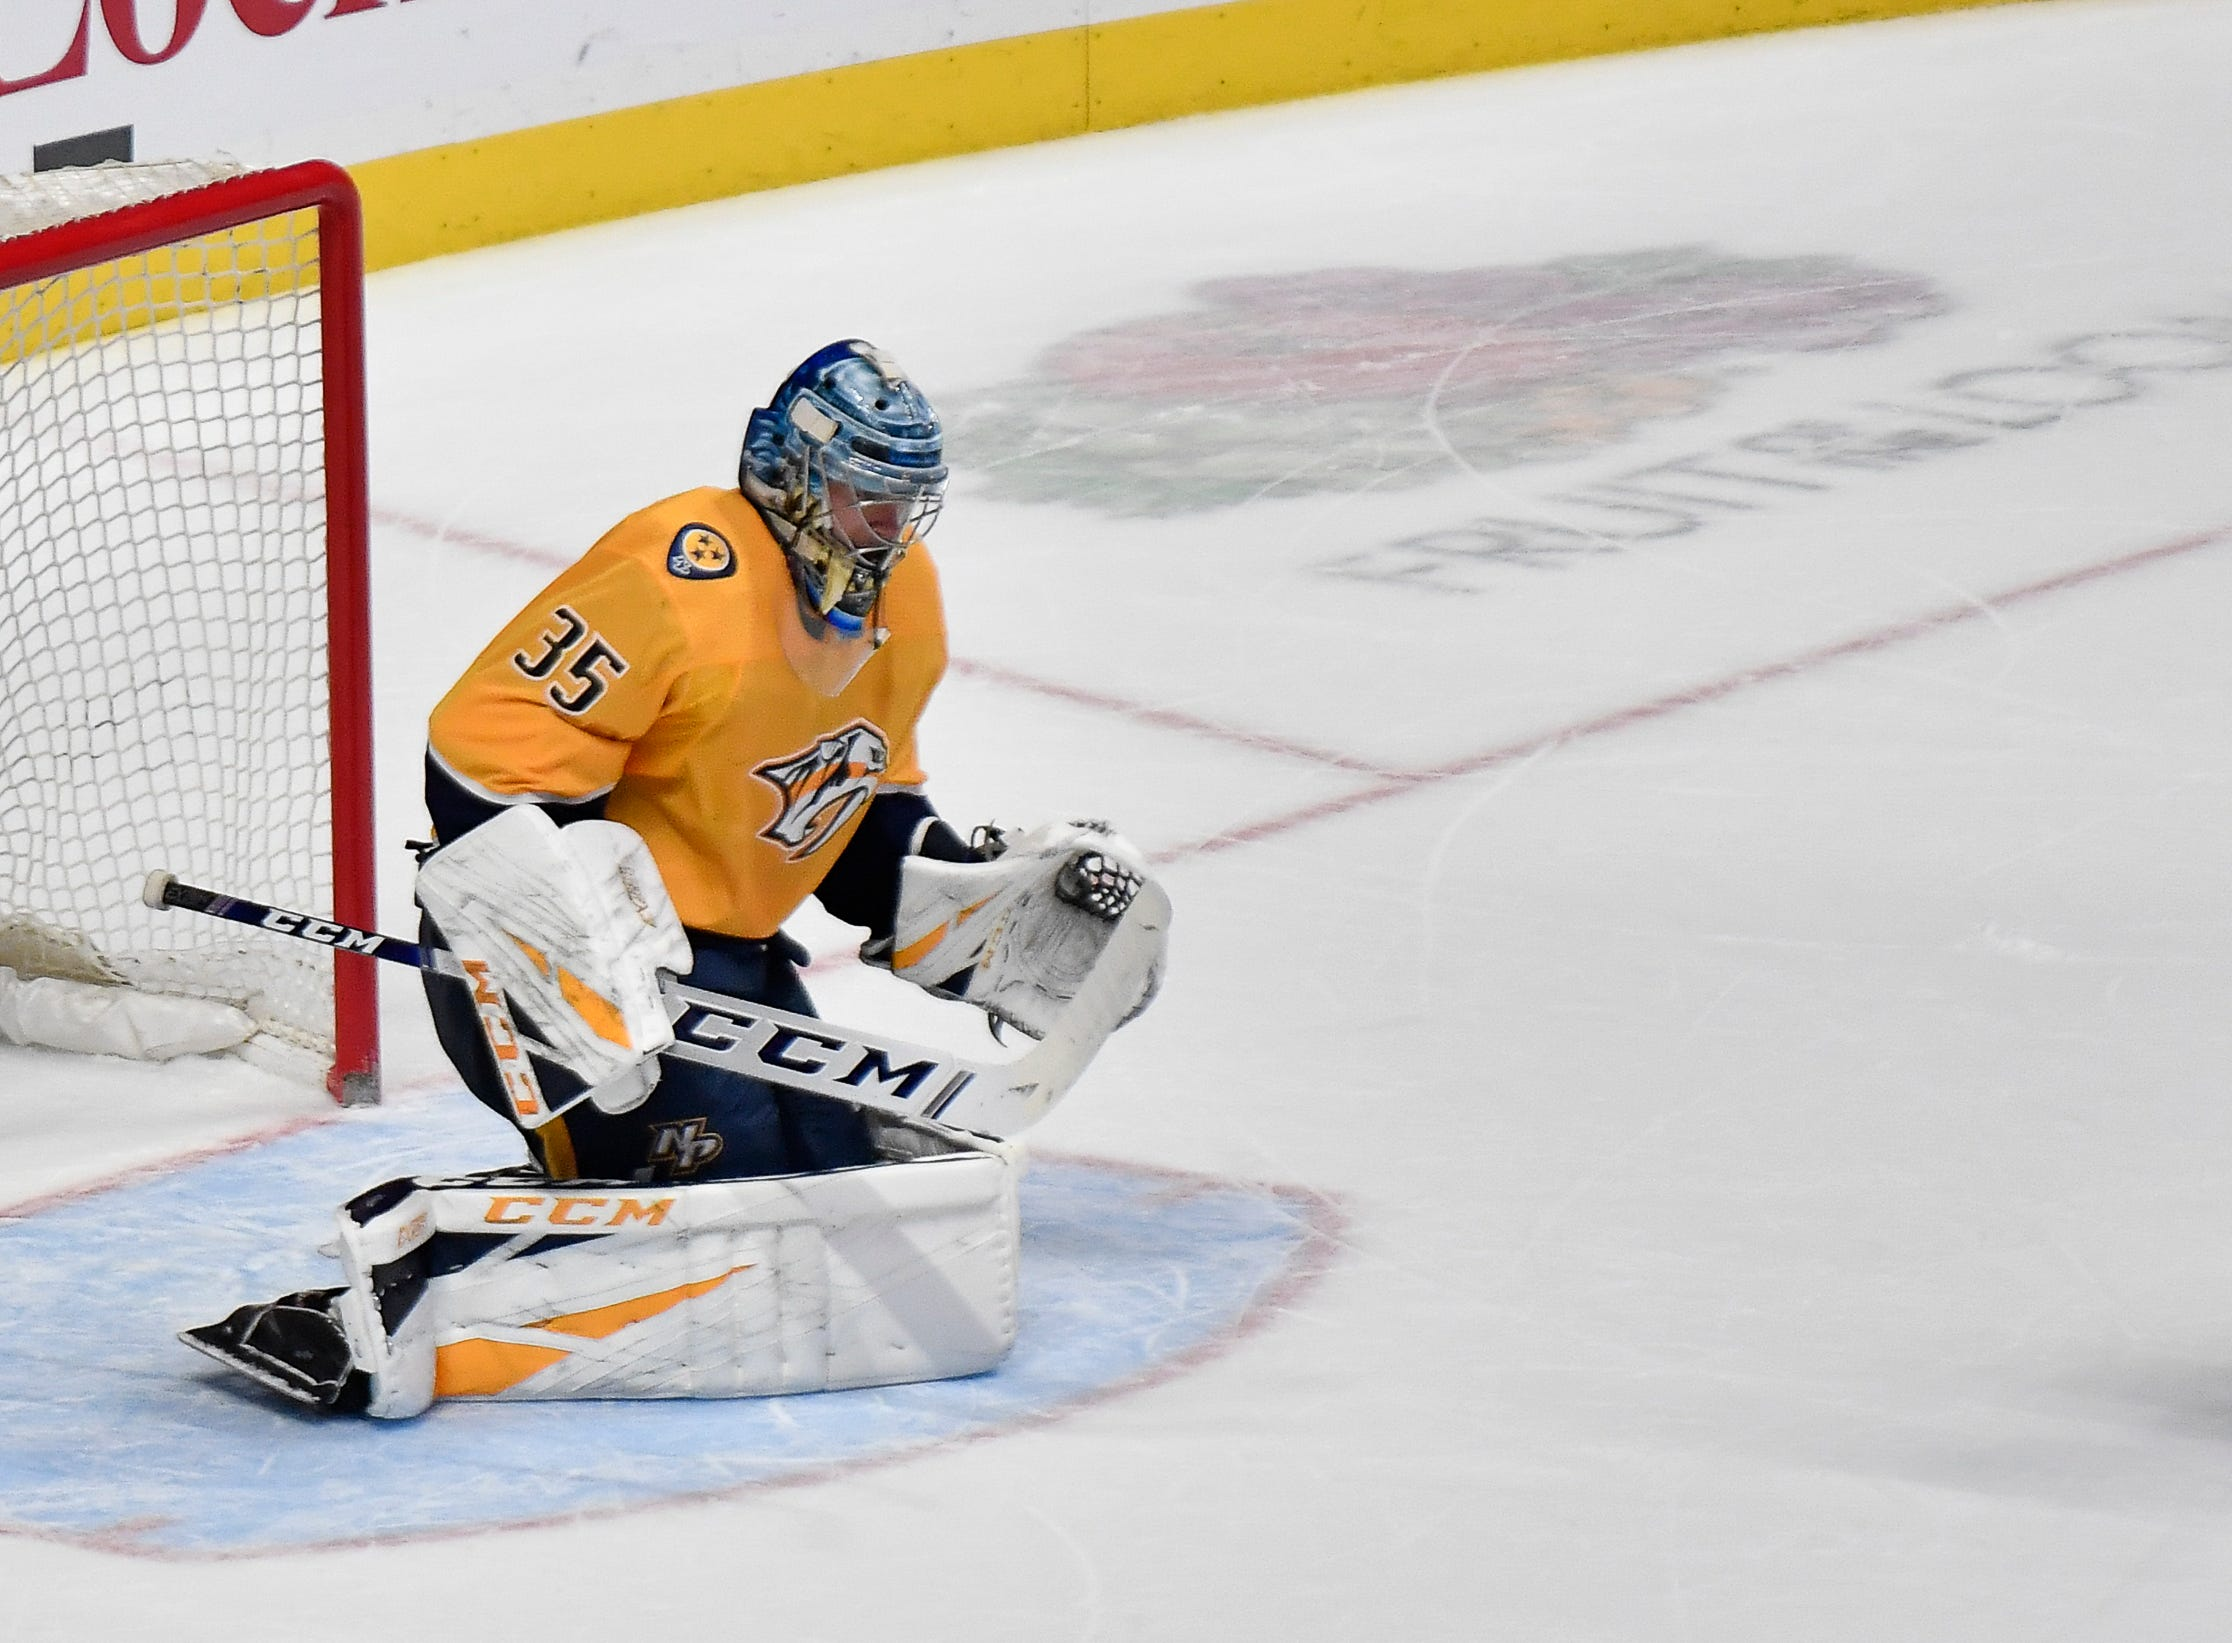 Penguins center Sidney Crosby (87) scores a goal past Predators goaltender Pekka Rinne (35) during a shootout in overtime at Bridgestone Arena Thursday, March 21, 2019 in Nashville, Tenn.